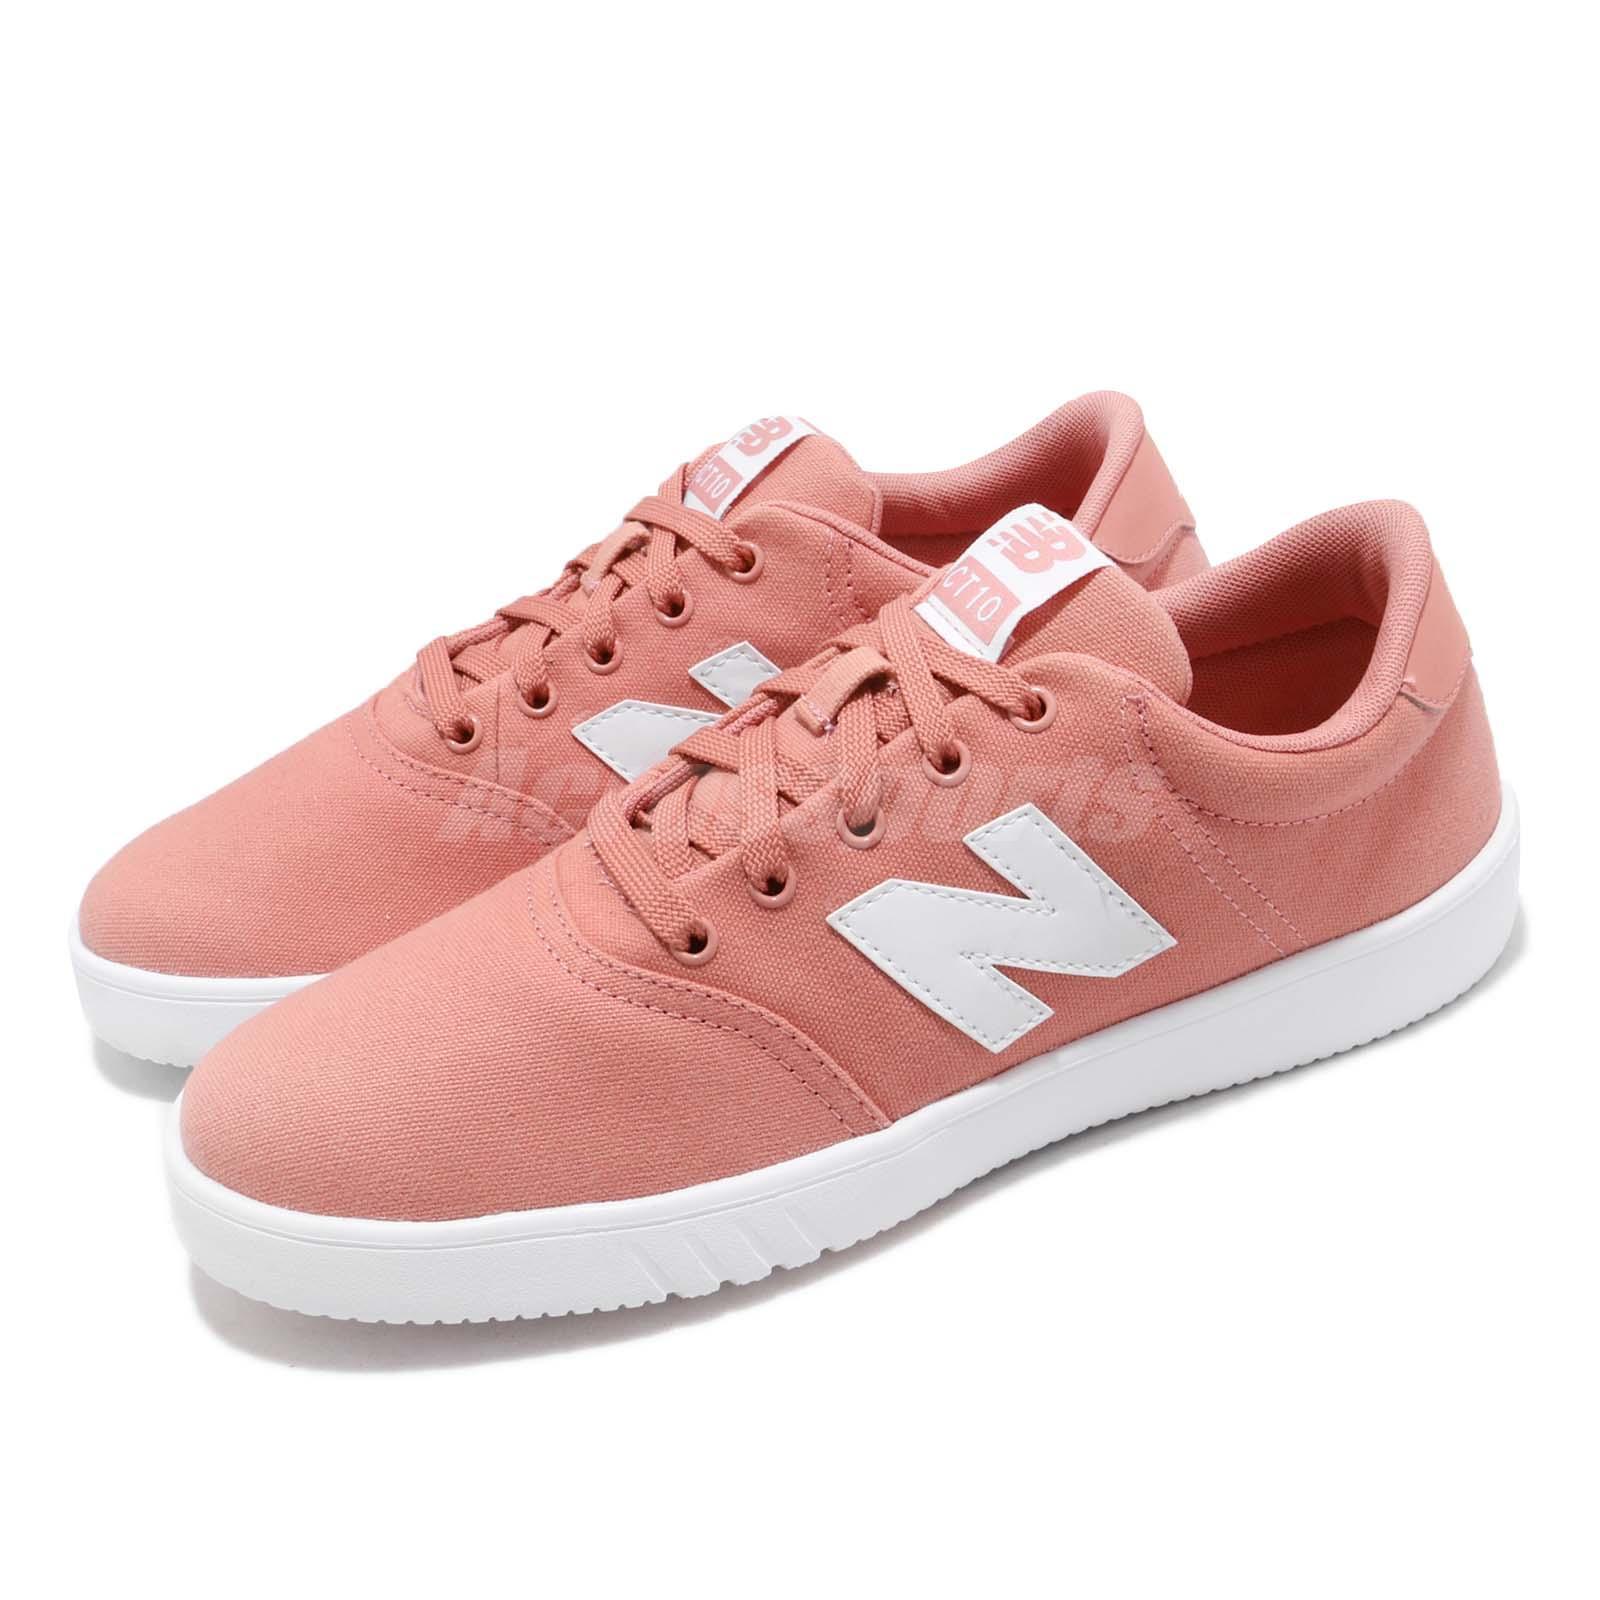 New Balance CT10MYB D CT10 Pink White